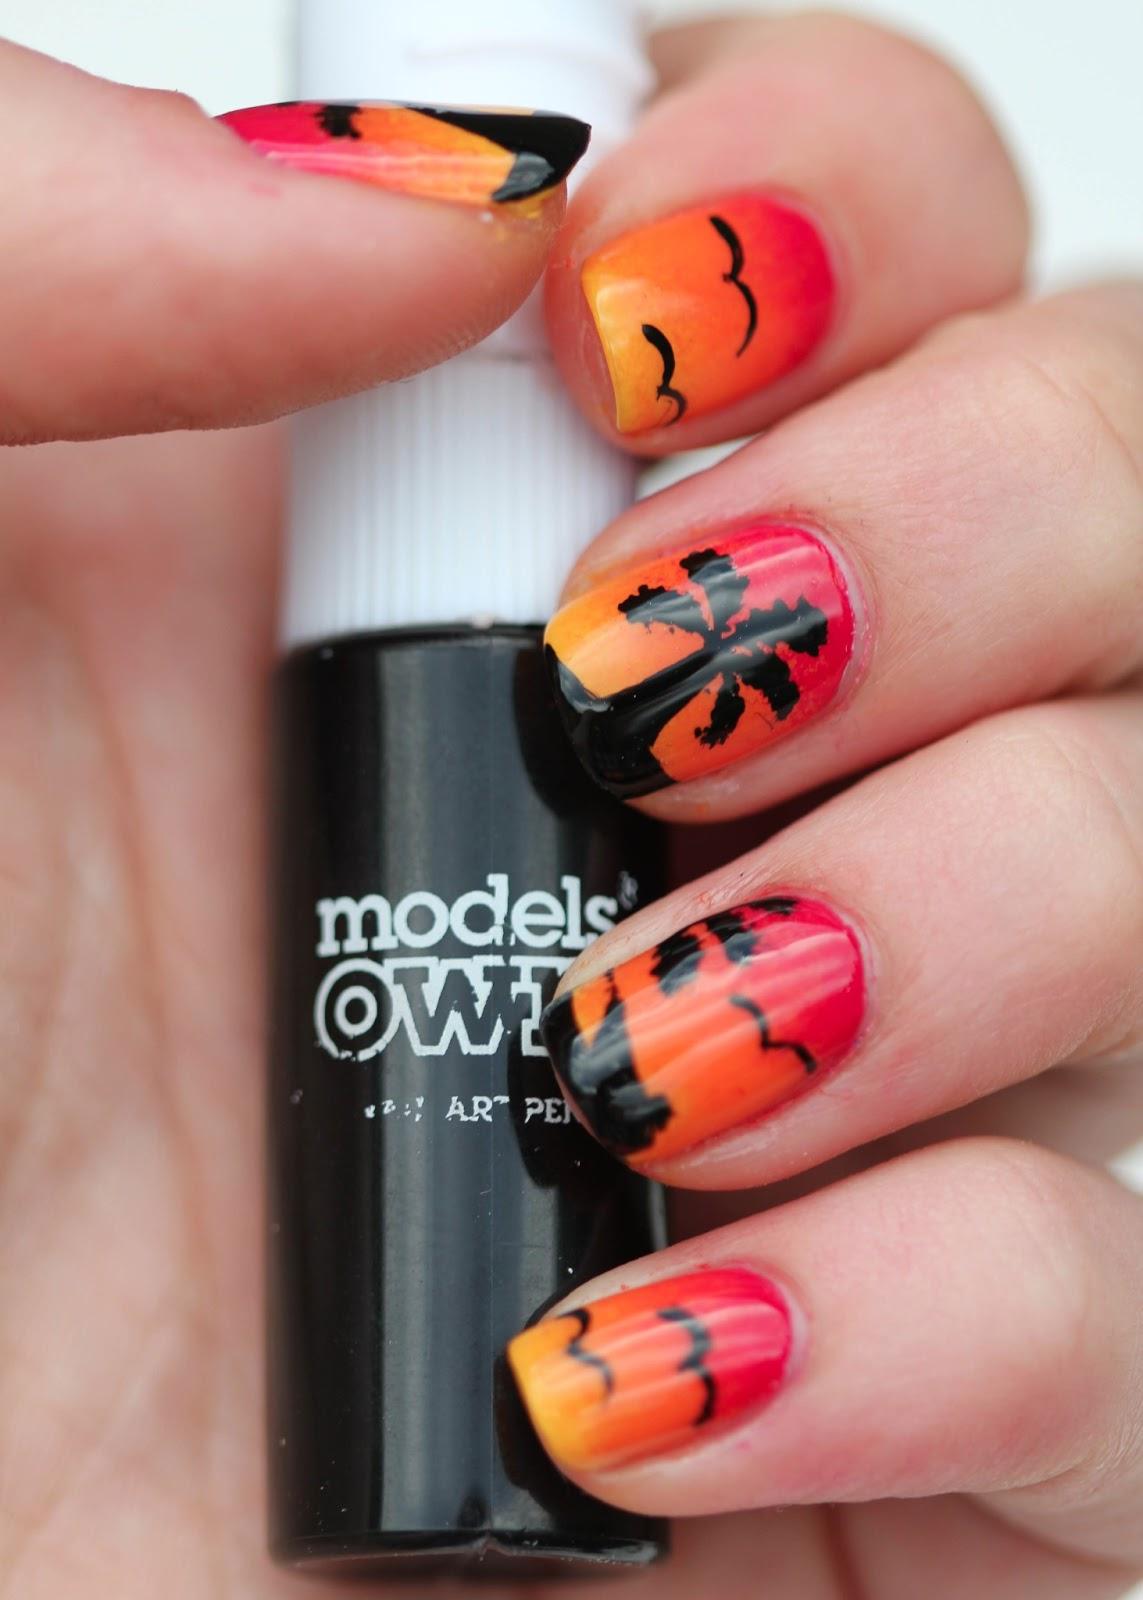 Fundamentally flawless sunset nail art with palm trees and birds sunset nail art with models own black nail art pen prinsesfo Gallery